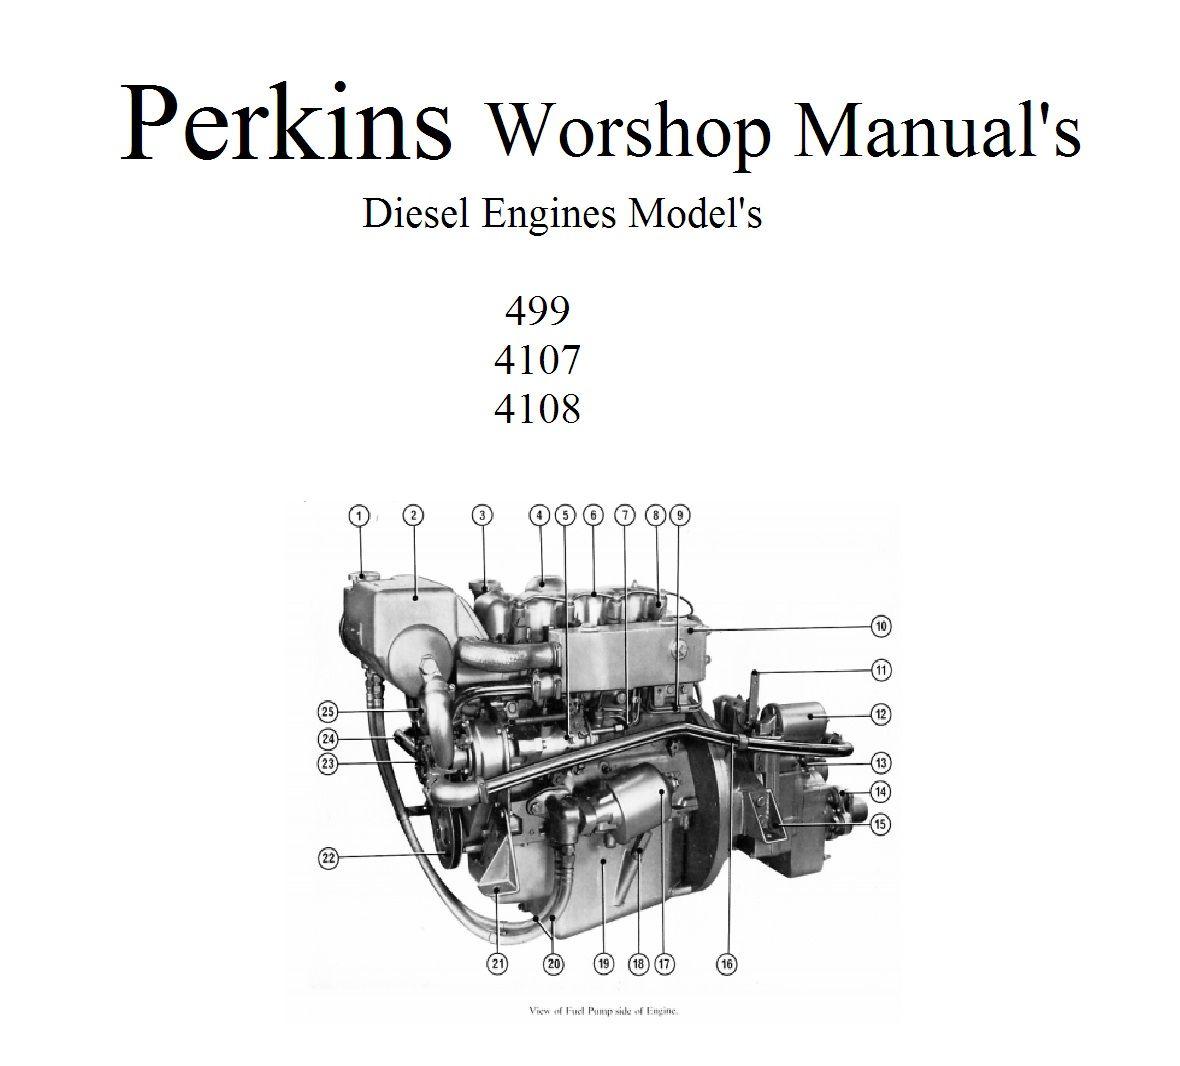 Perkins Marine Diesel Engines 4108 4107 499 Workshop Manuals Engine Wiring Diagram Collection Narrowboat